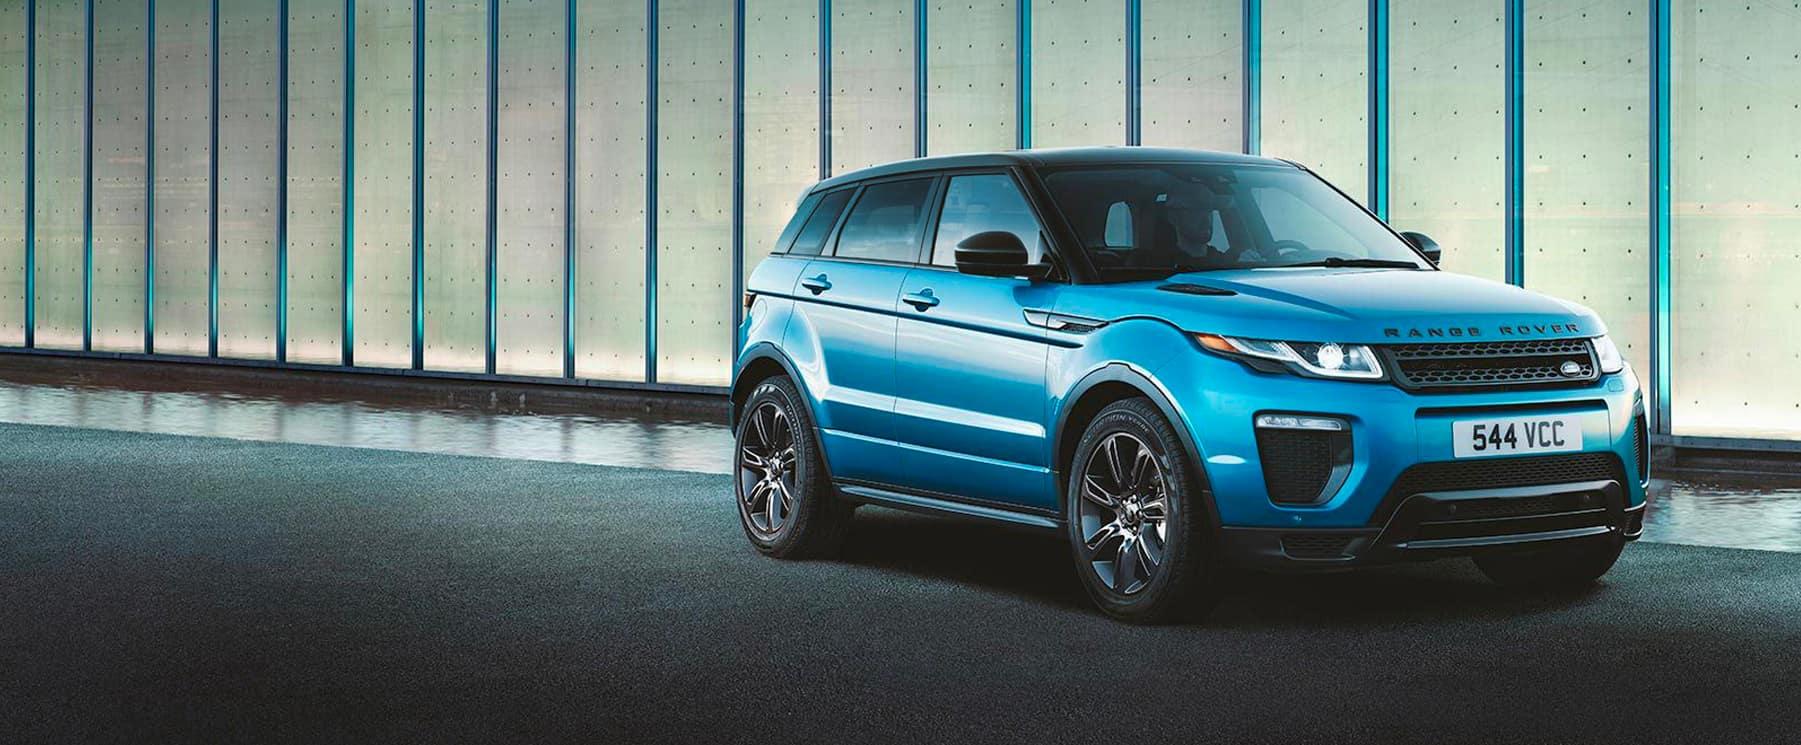 2018 Range Rover Evoque Overview